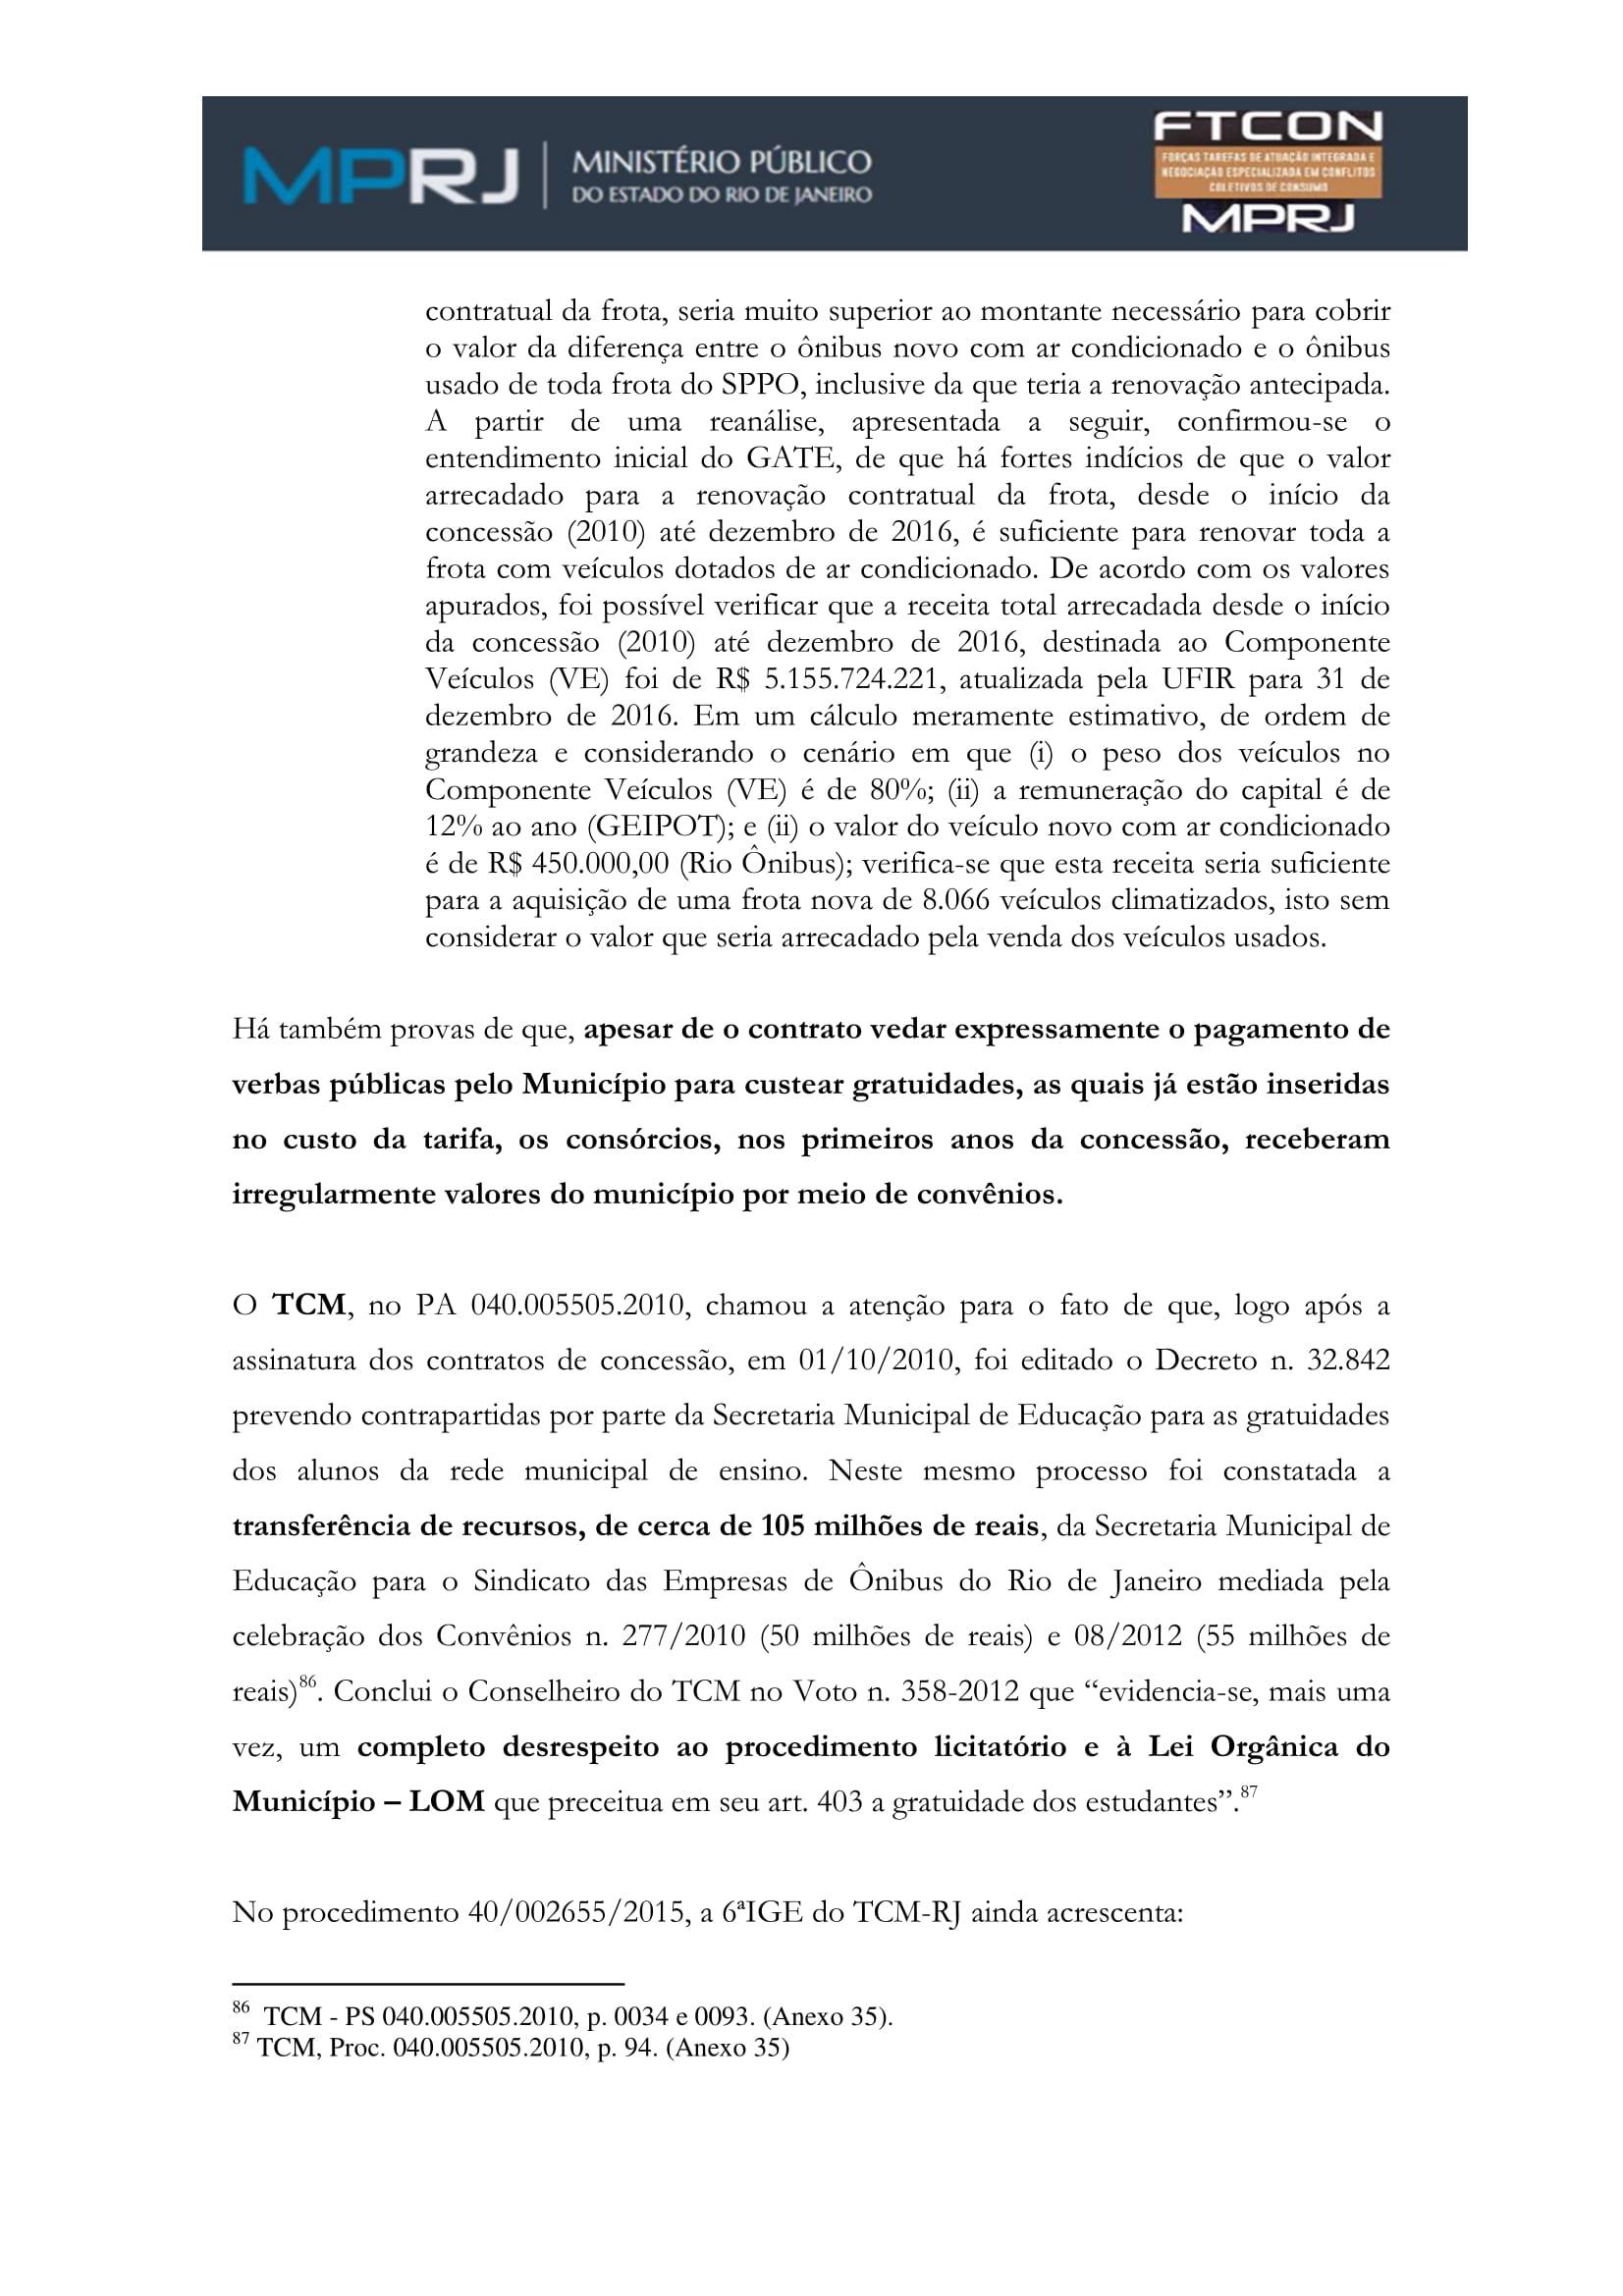 acp_caducidade_onibus_dr_rt-095